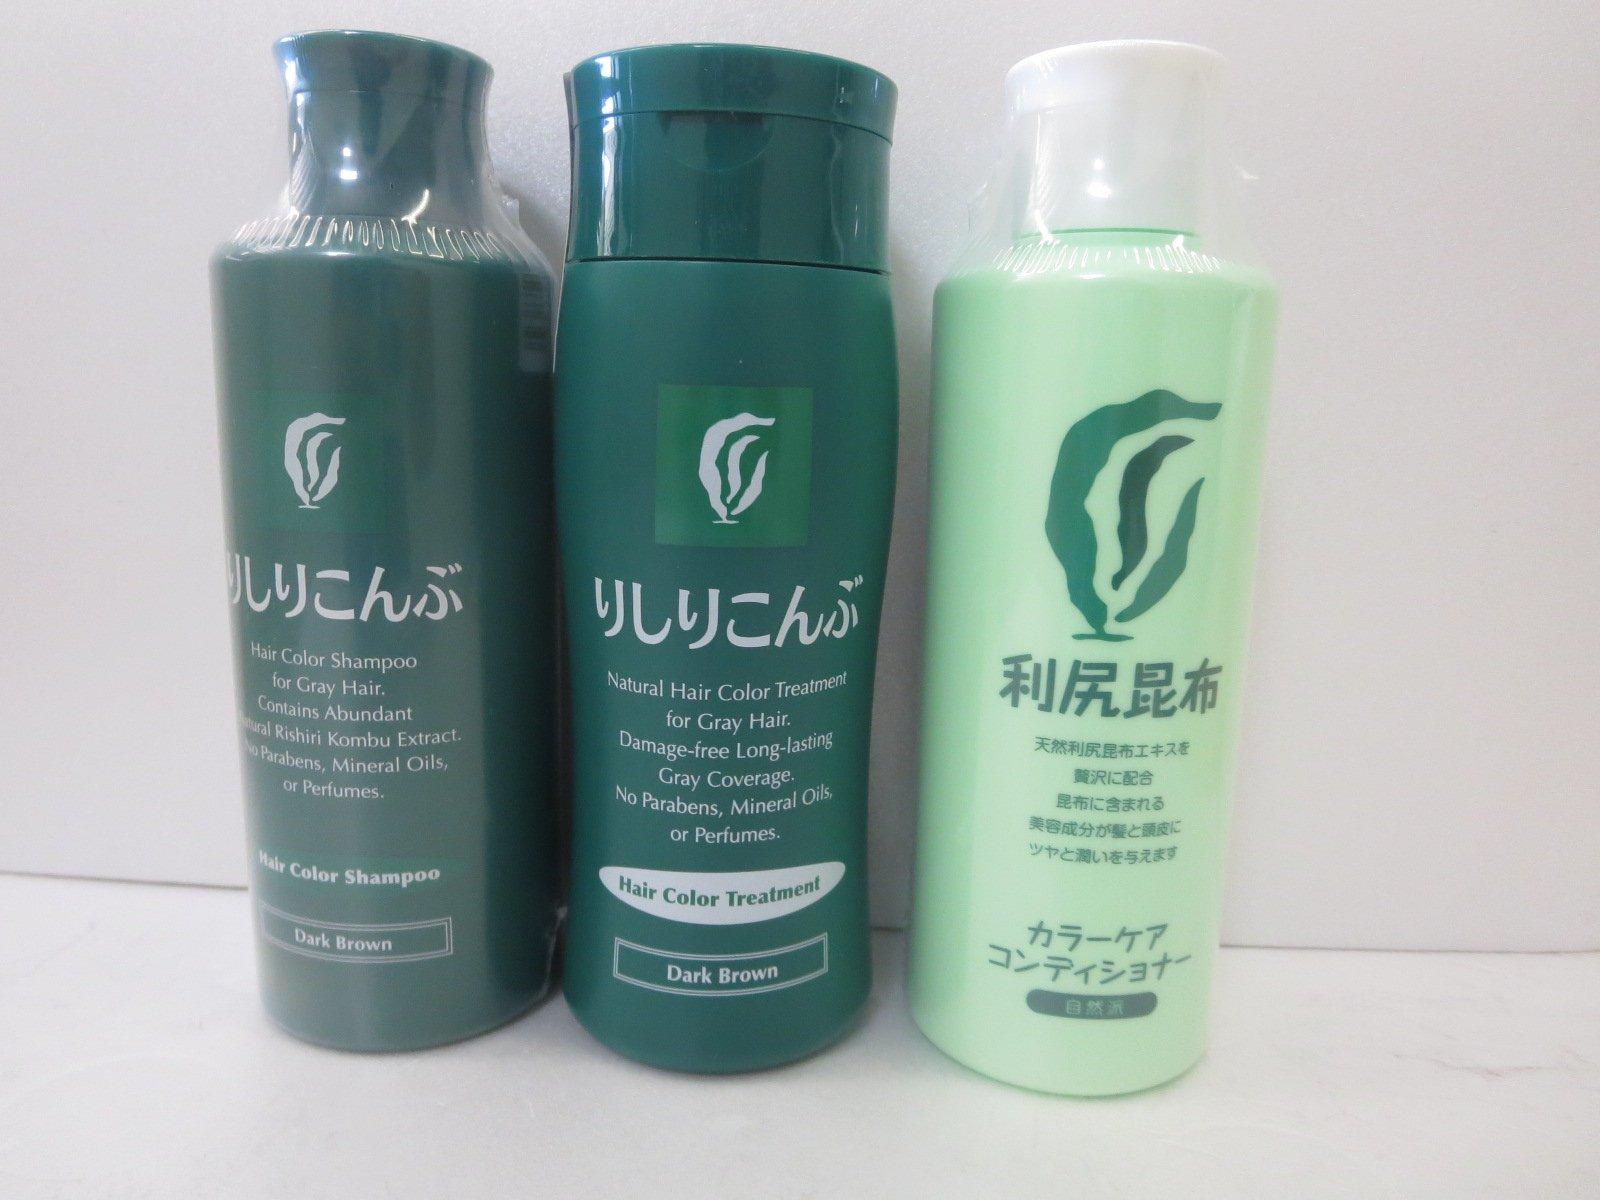 Rishiri Hair Color Set n Color Shampoo Dark Brown 6.7fl Oz + Hair Color Treatment Dark Brown 6.7fl + Color Care Conditioner 6.7fl Oz by Rishiri